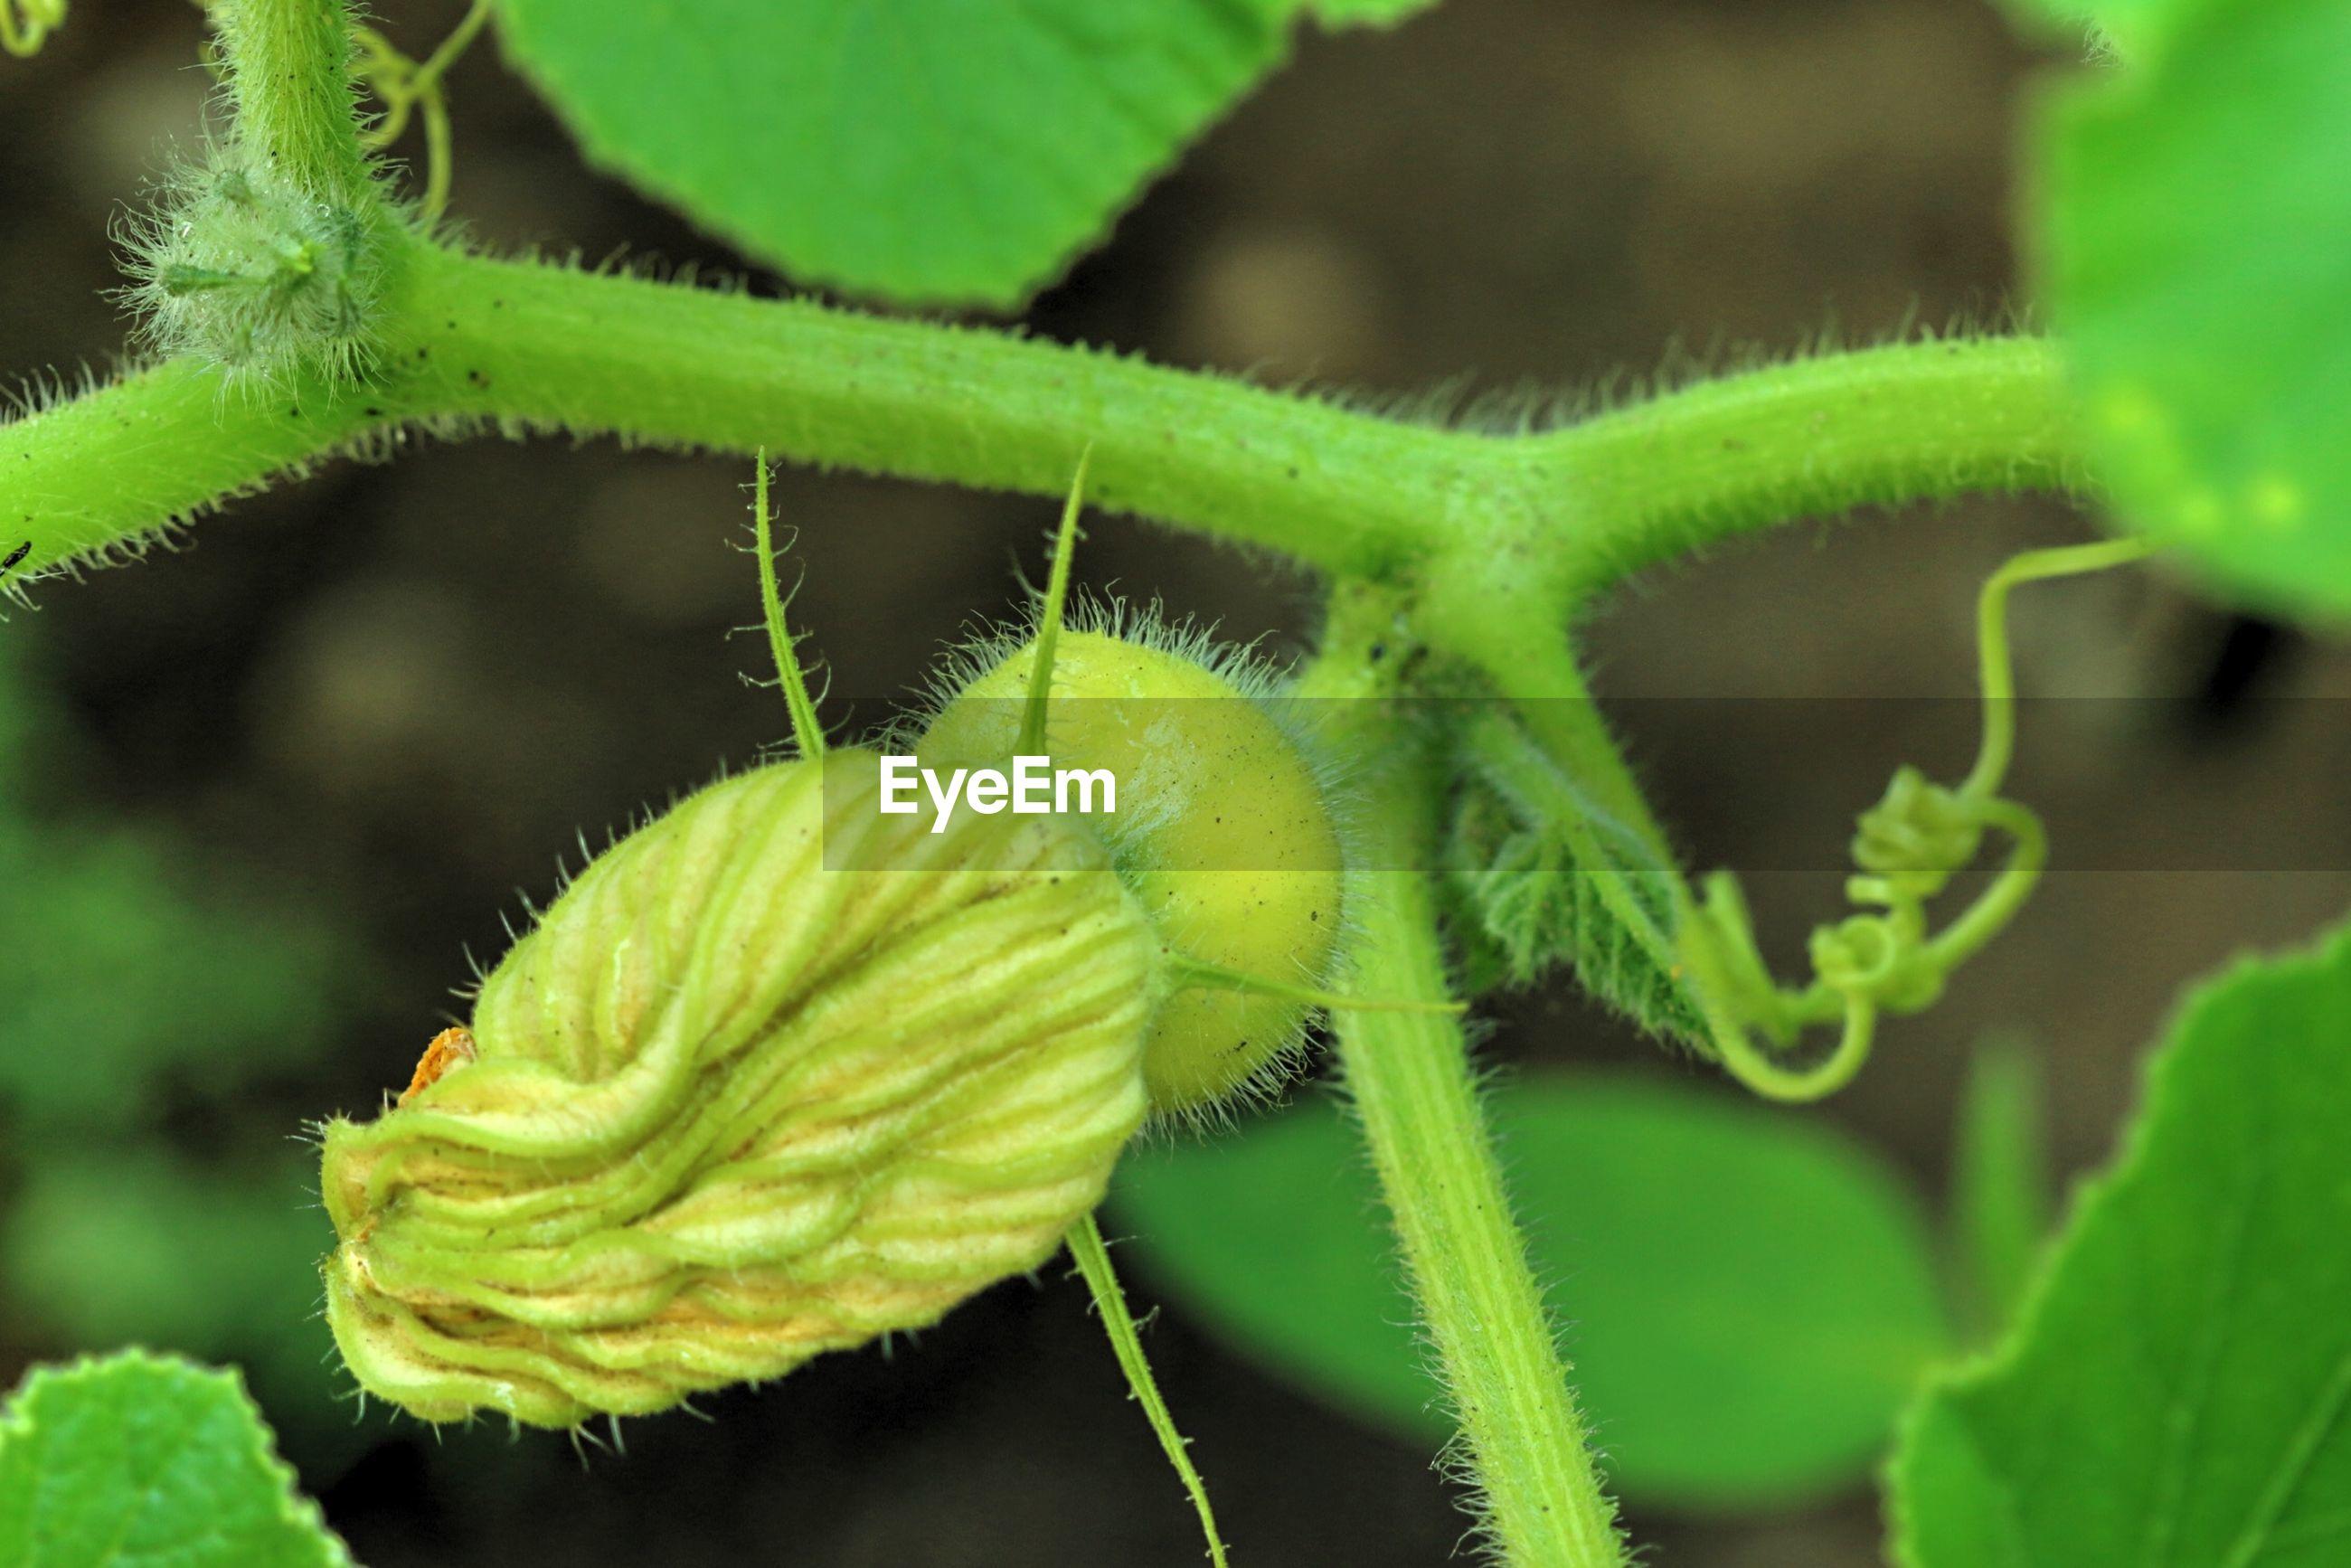 Close-up of green pumpkin plant